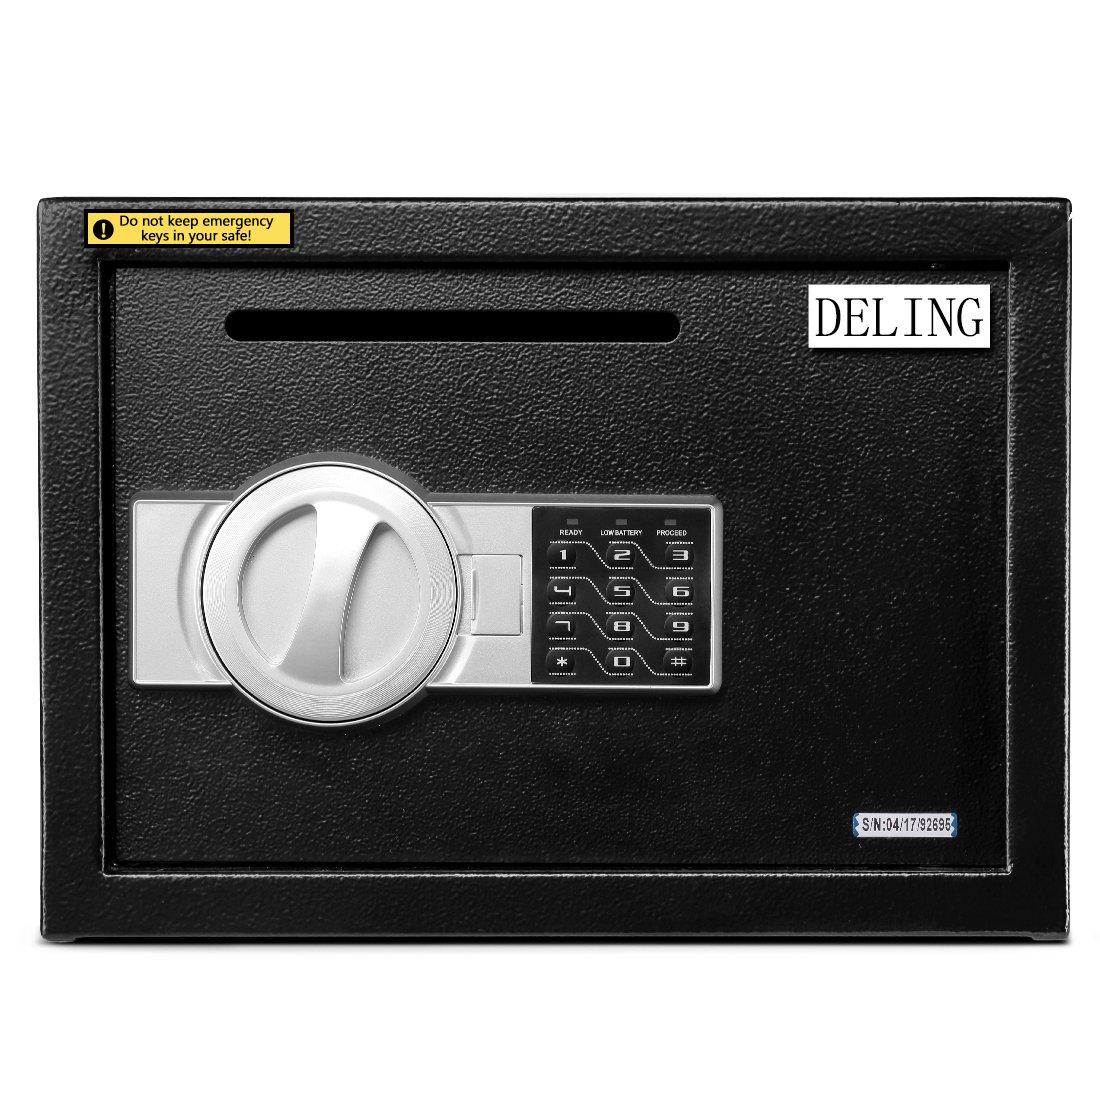 Wonlink Security safe 0.7cubic feet srorage safe digital closet home security box keypad lock (0.7cubic feet Password Lock)